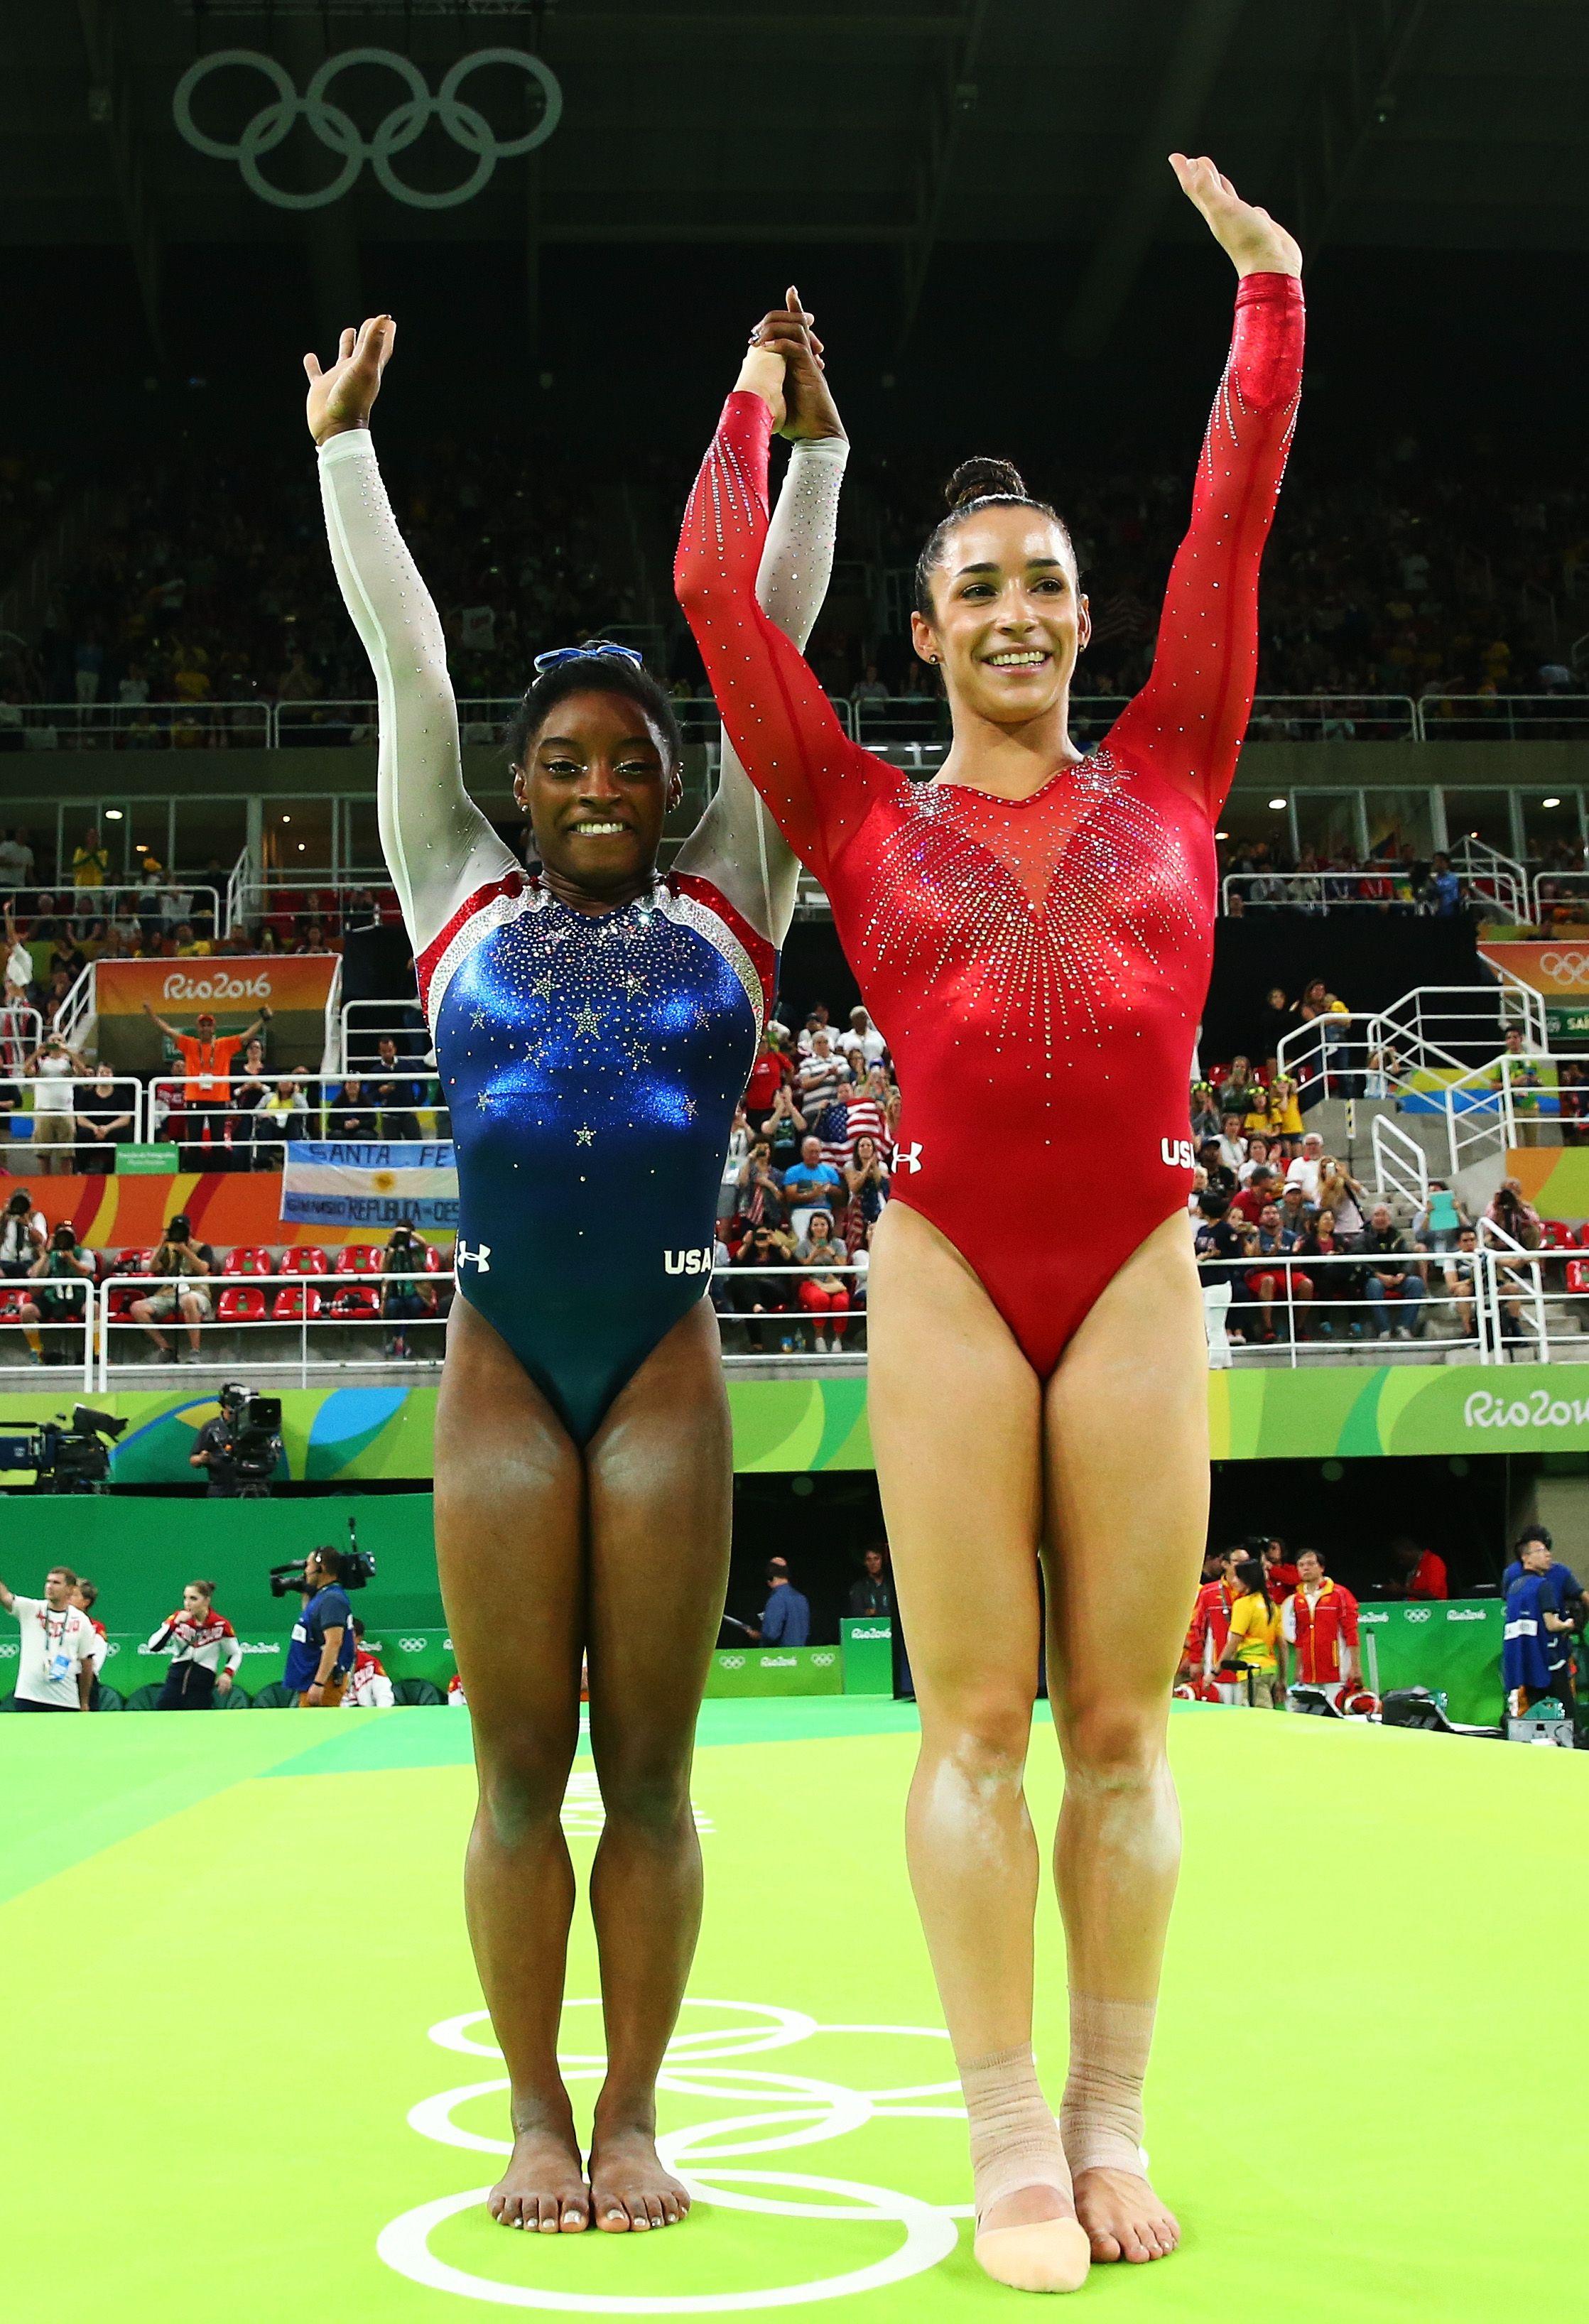 girl-sexy-gymnastics-team-foto-bugil-pornstar-korea